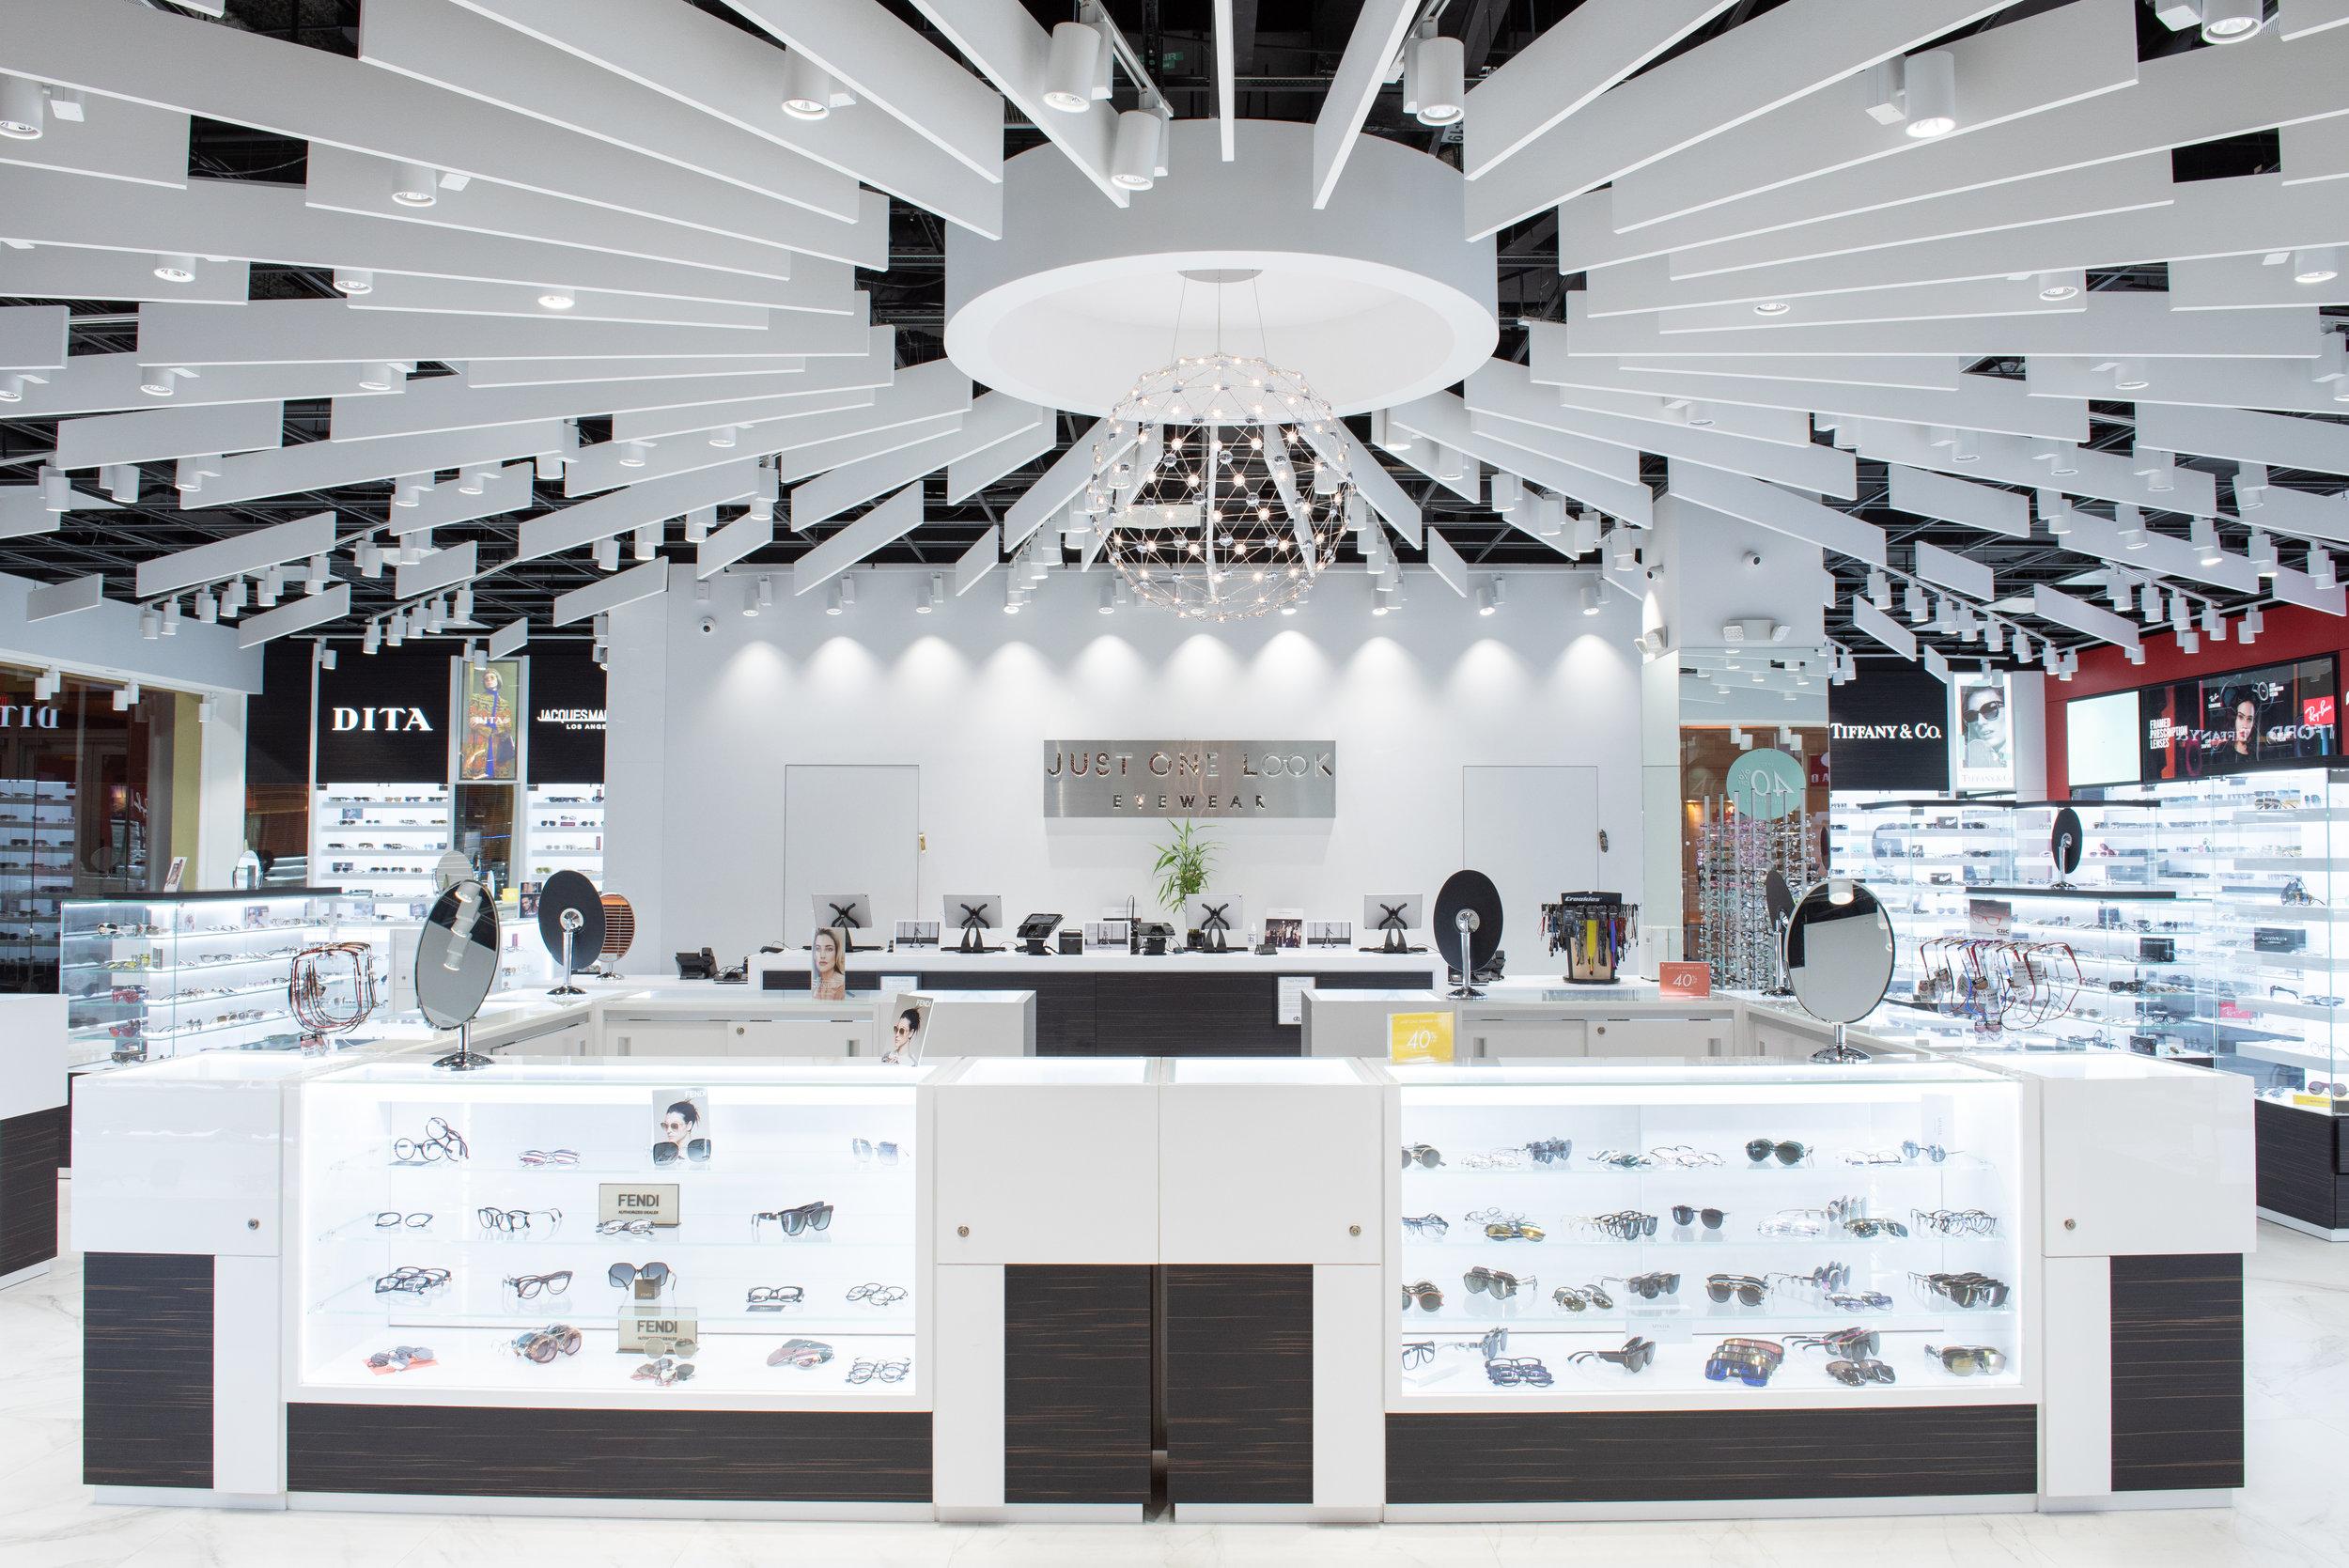 Stores-27.jpg